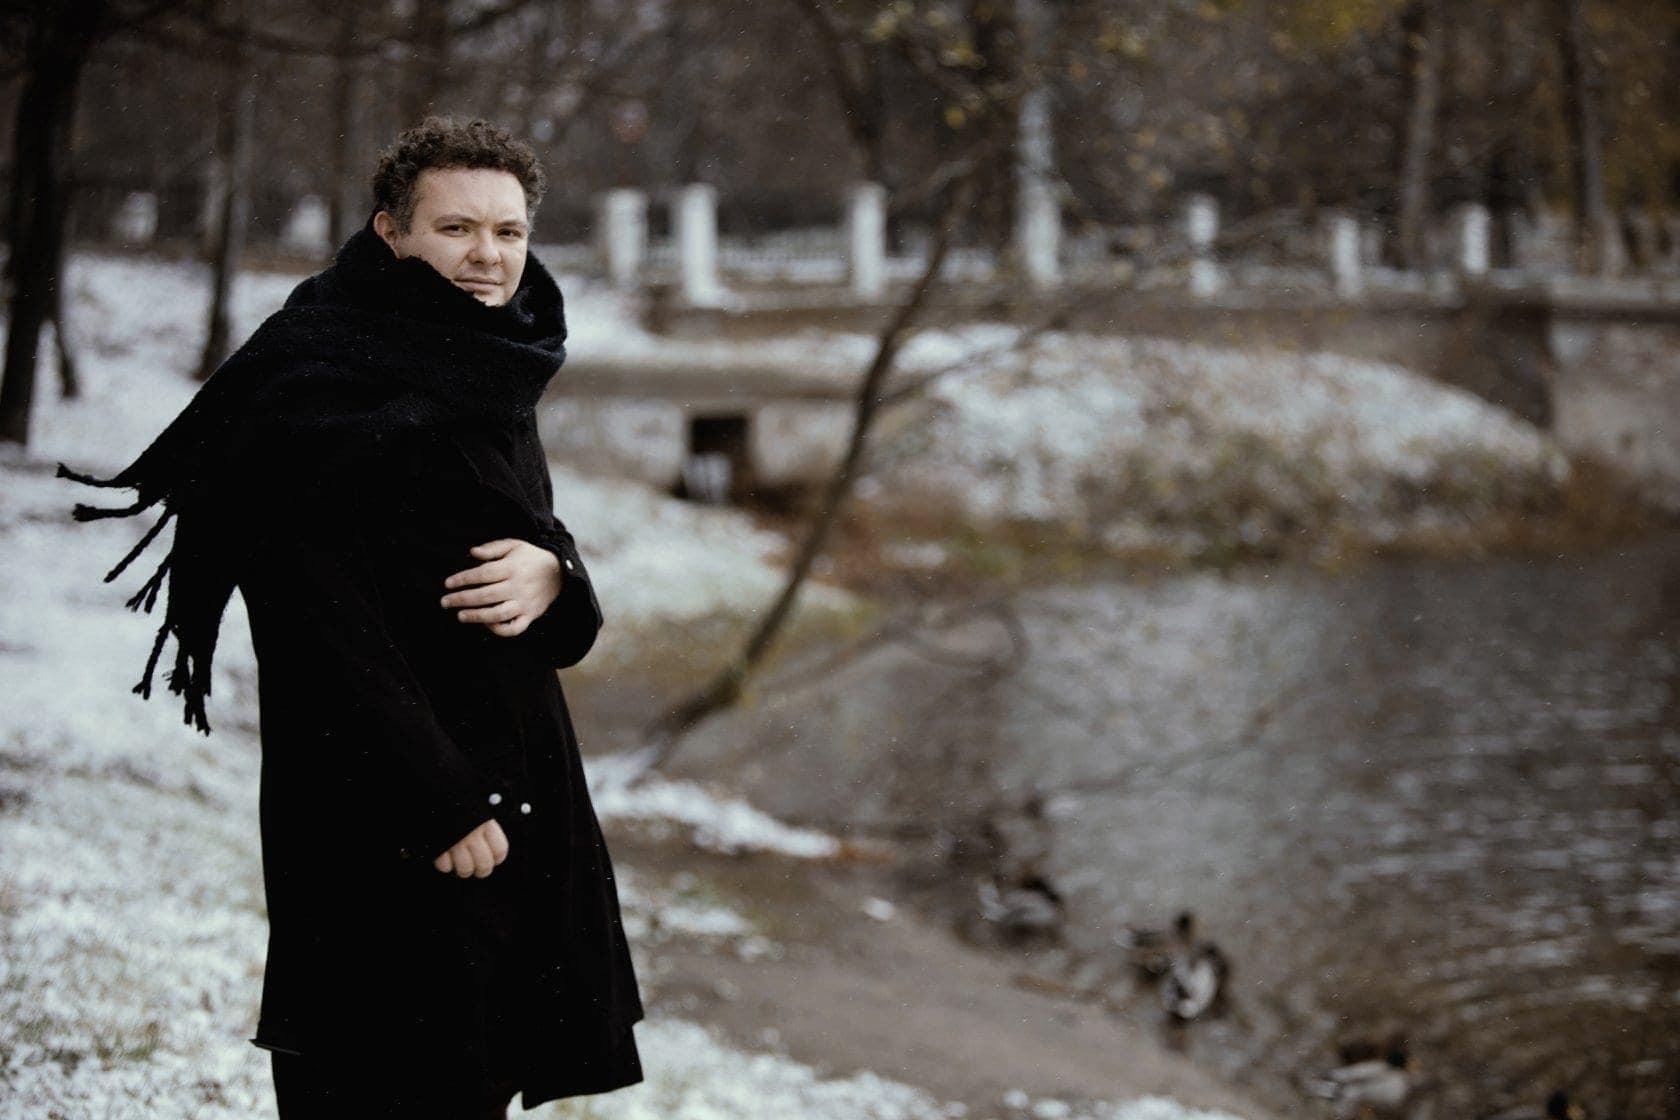 Юрий Фаворин. Фото - Ира Полярная